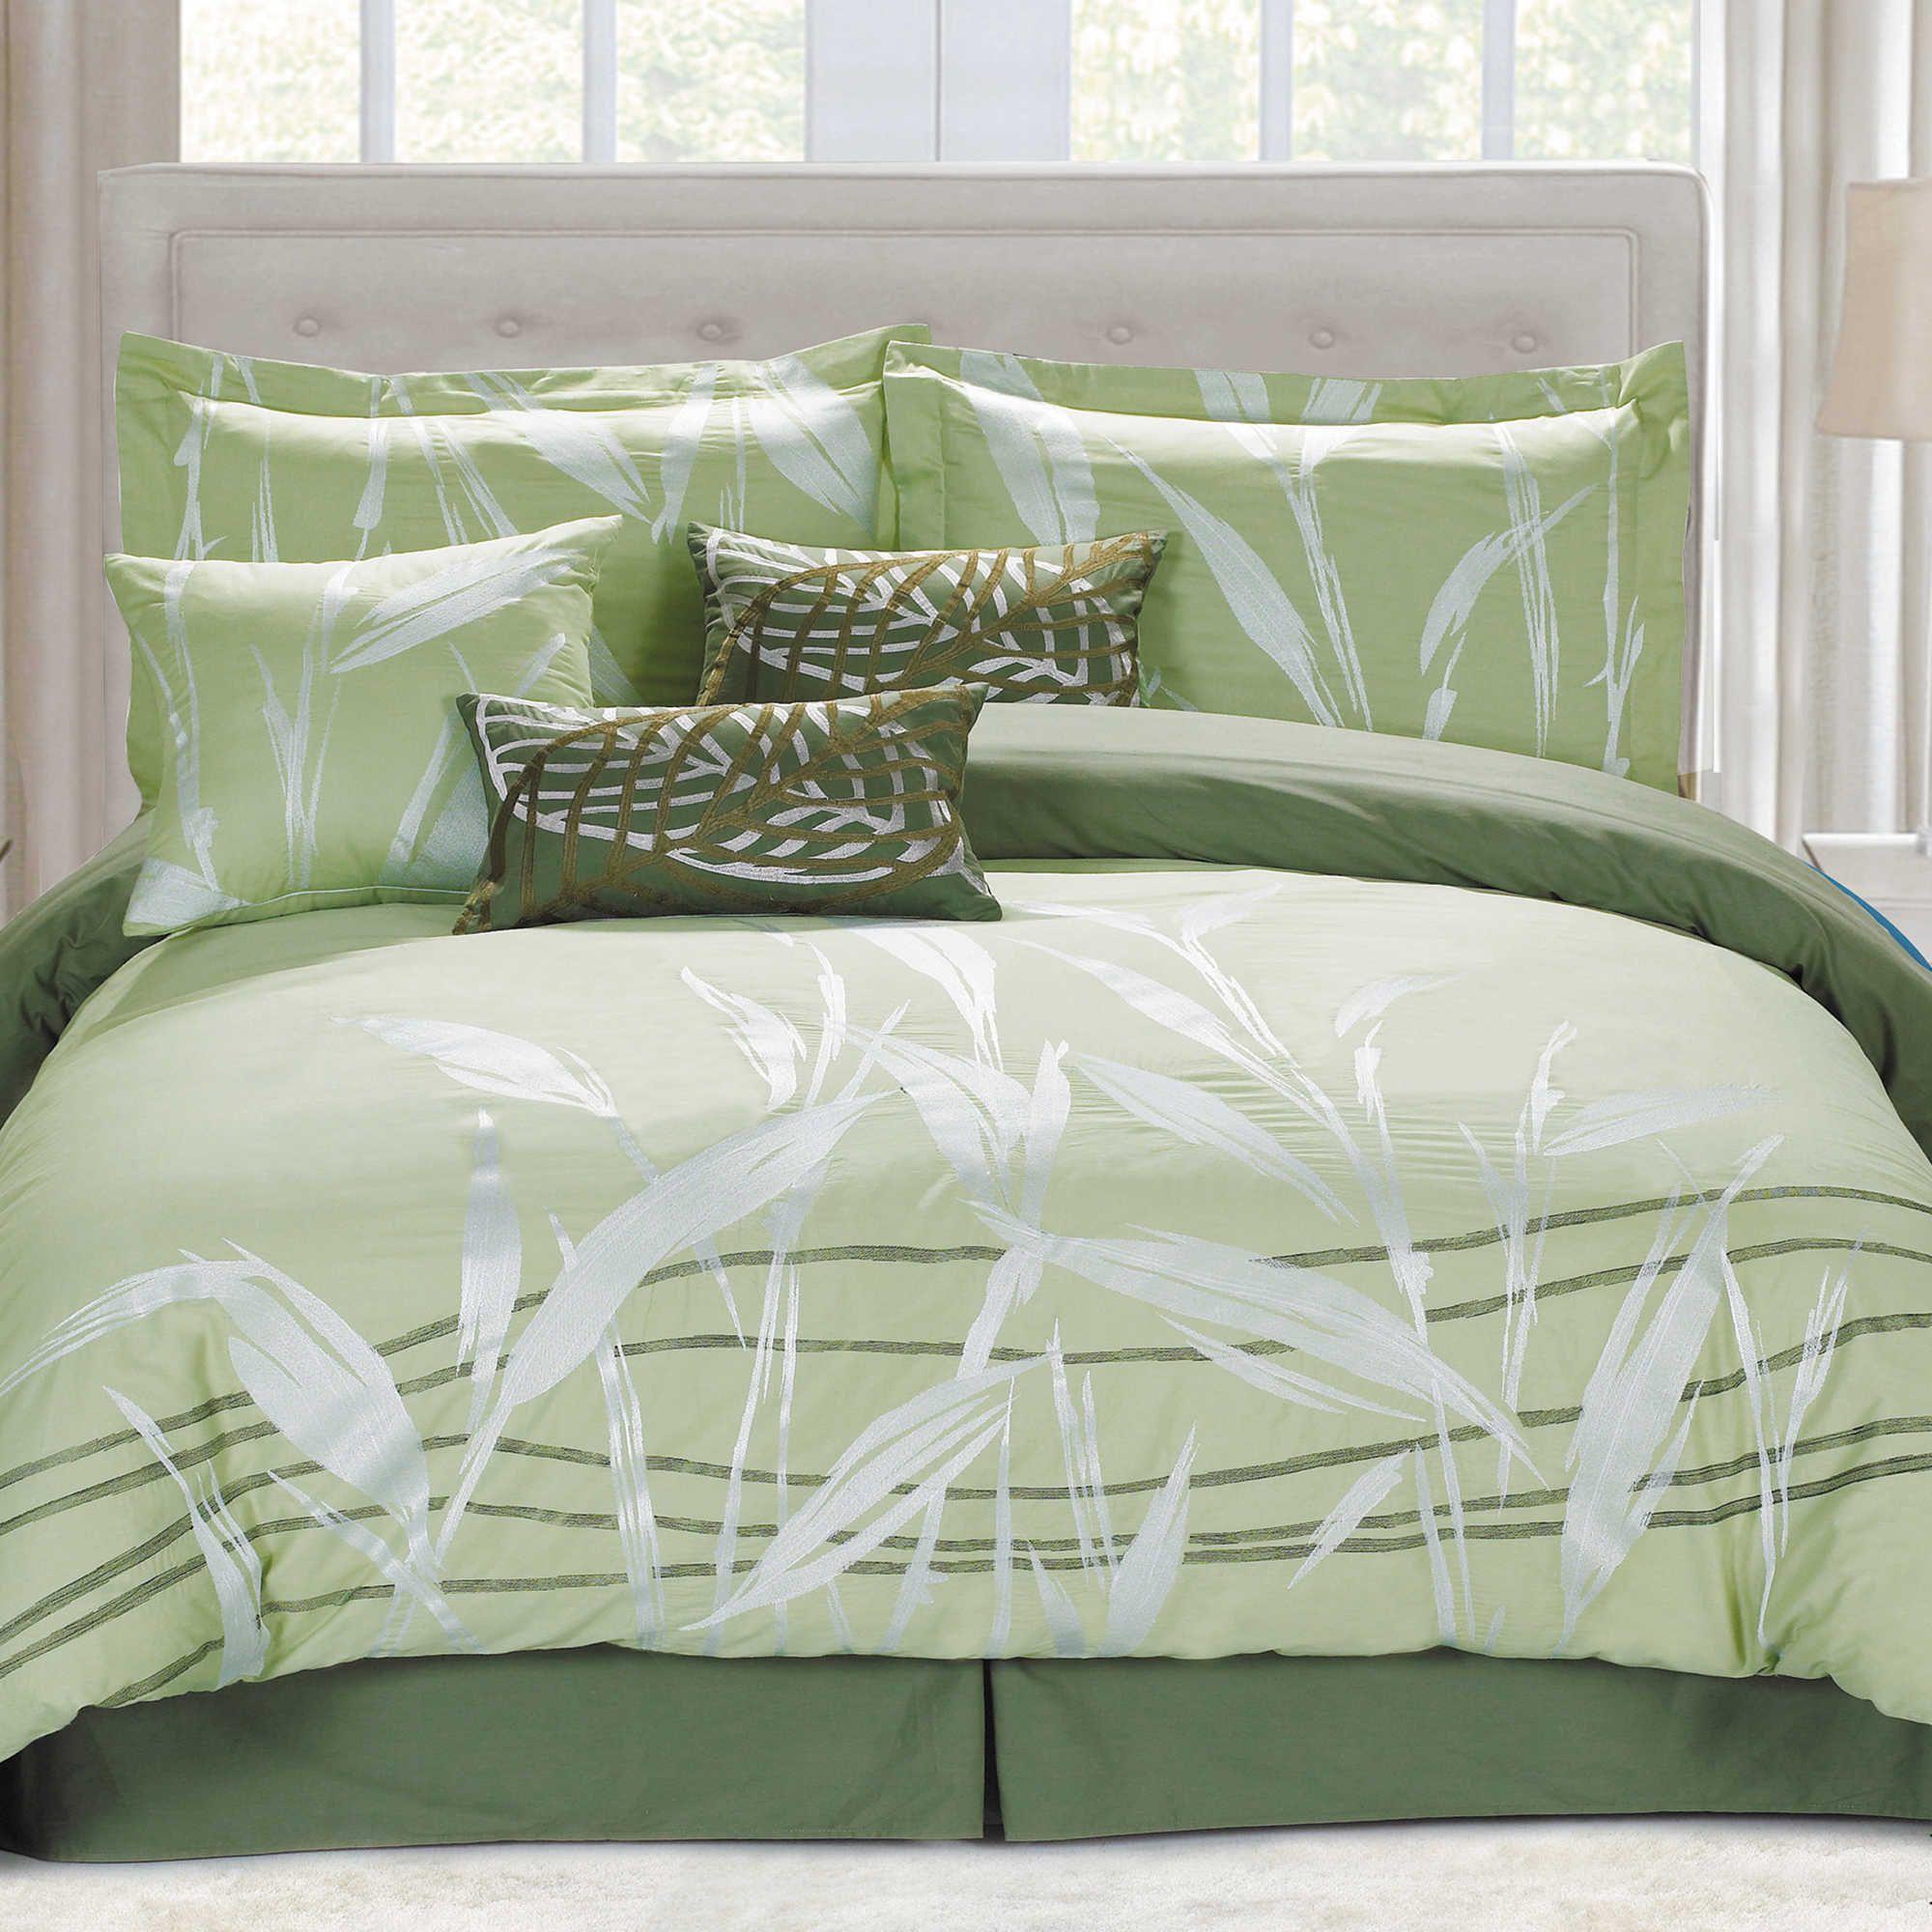 eggshell comforter sets expand to brisbane set p click bedding coastal